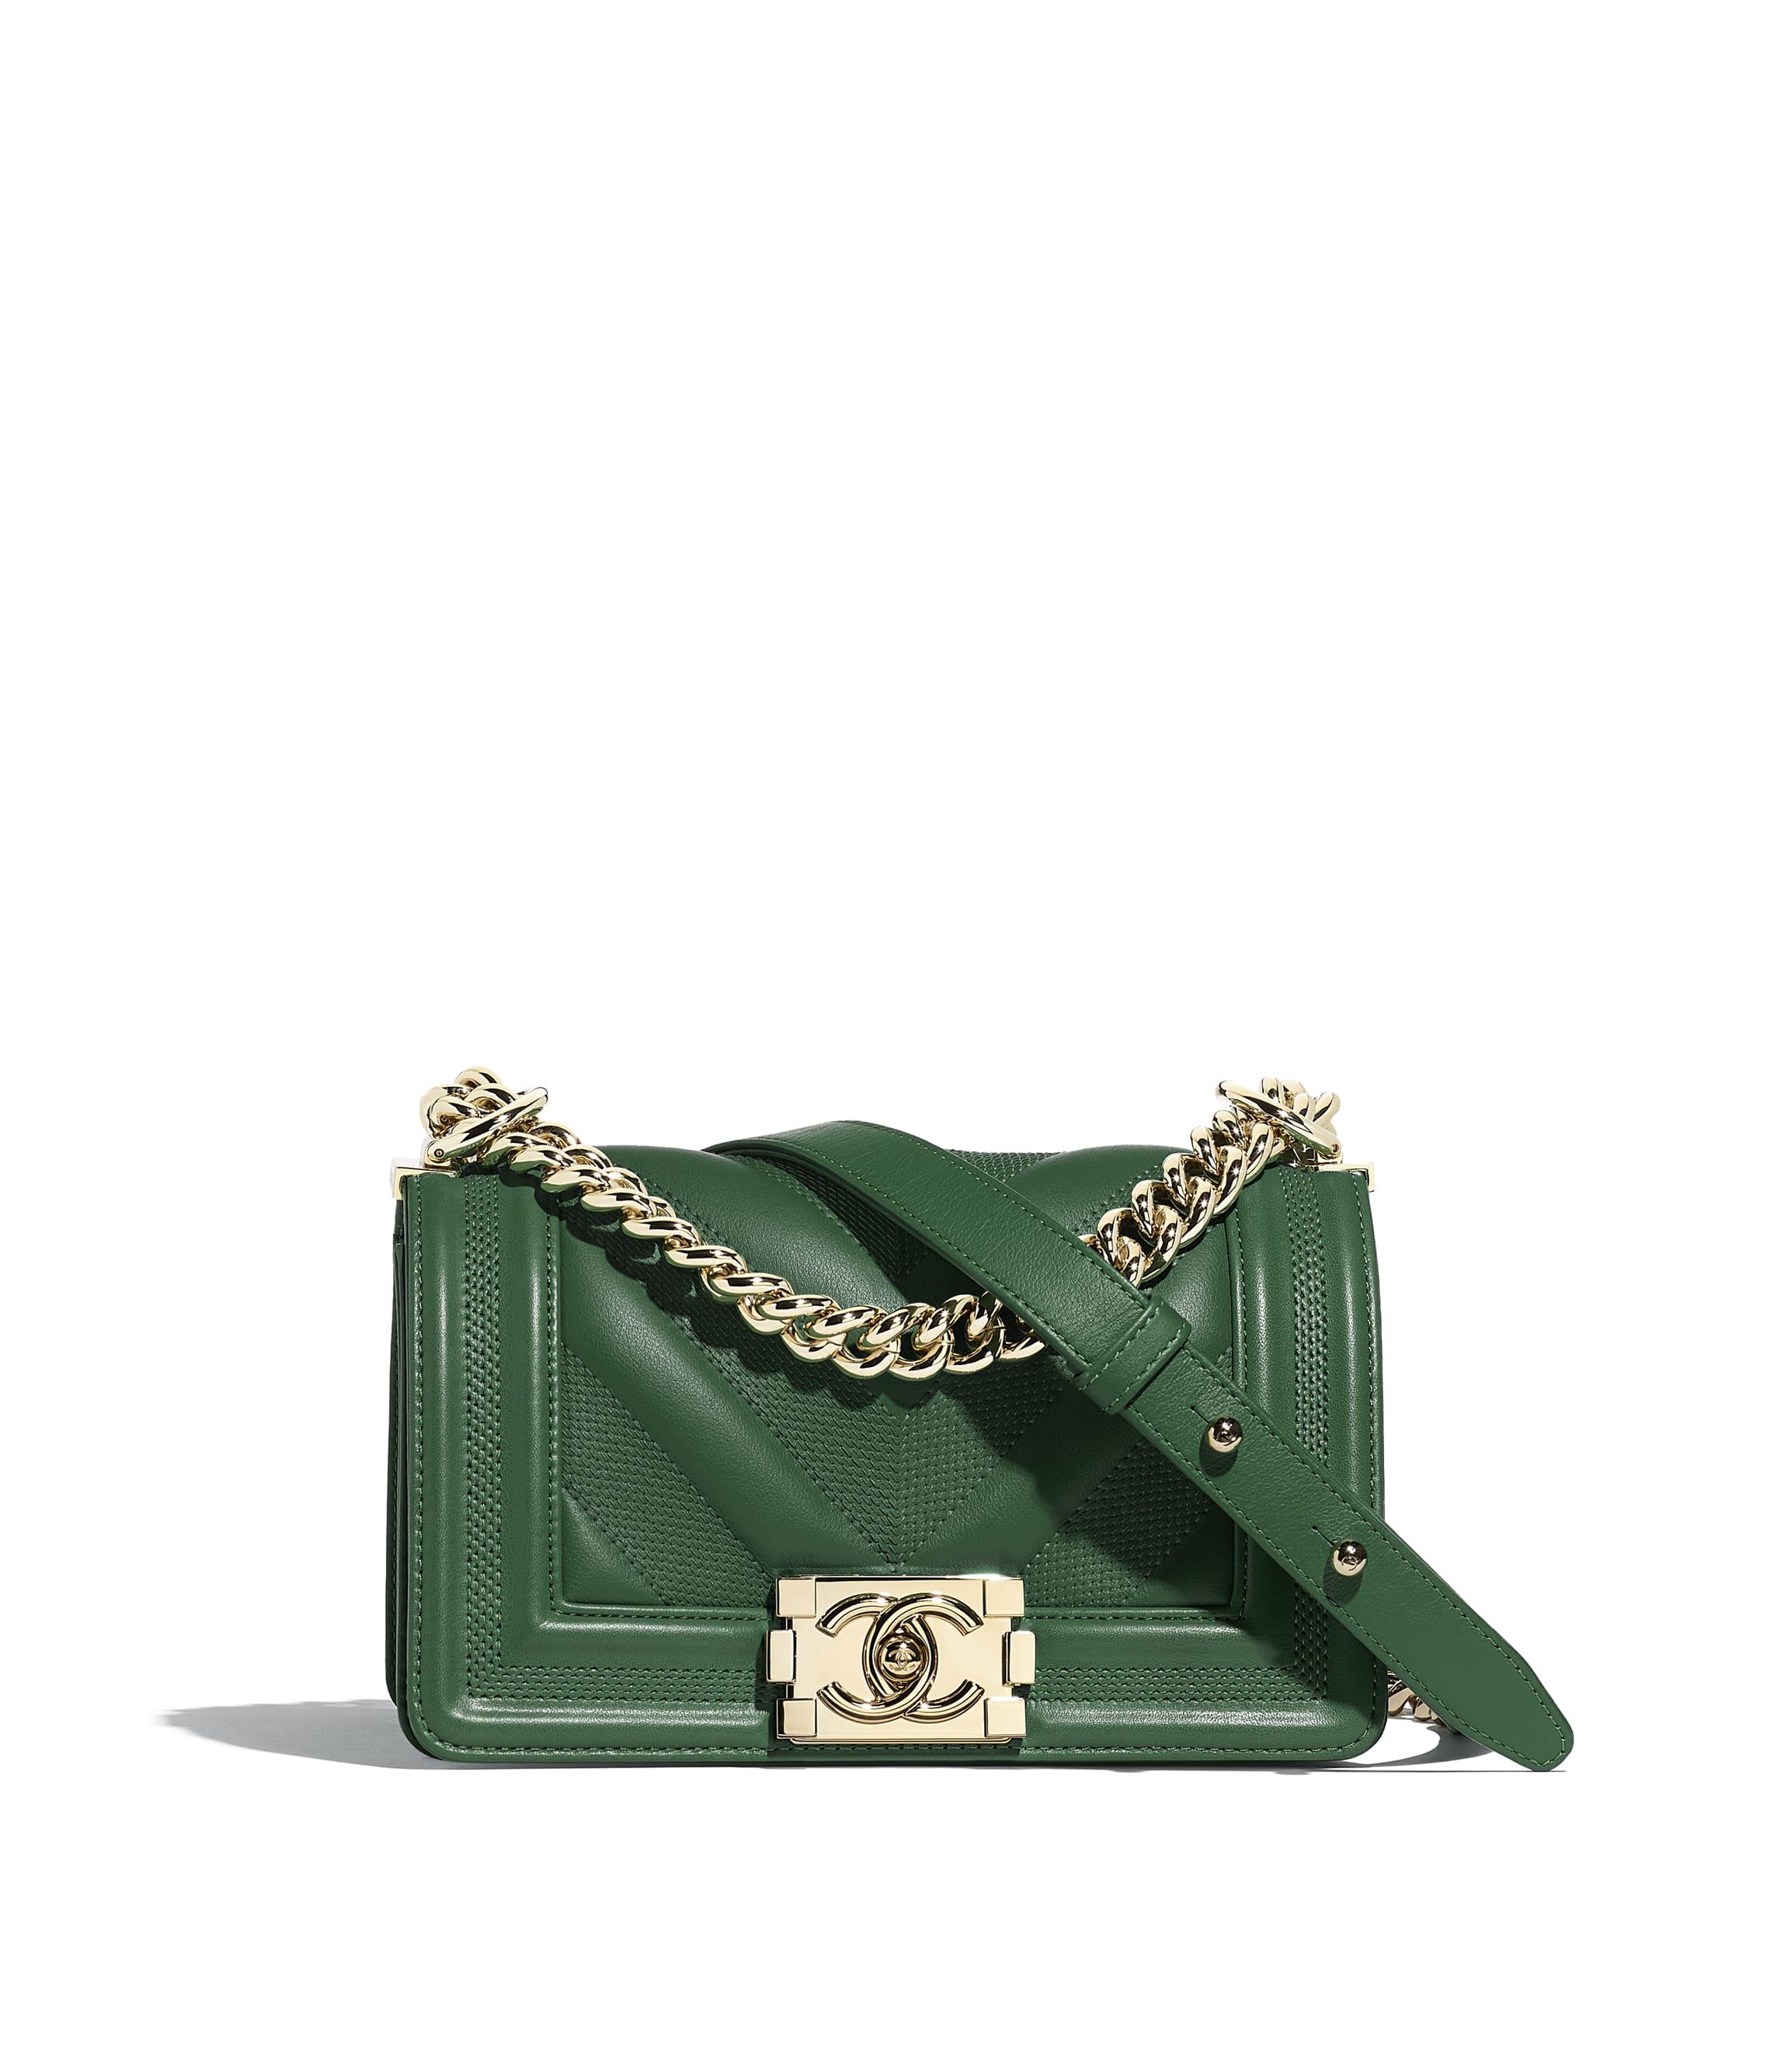 91c59fb5ee8 BOY CHANEL - Handbags - CHANEL